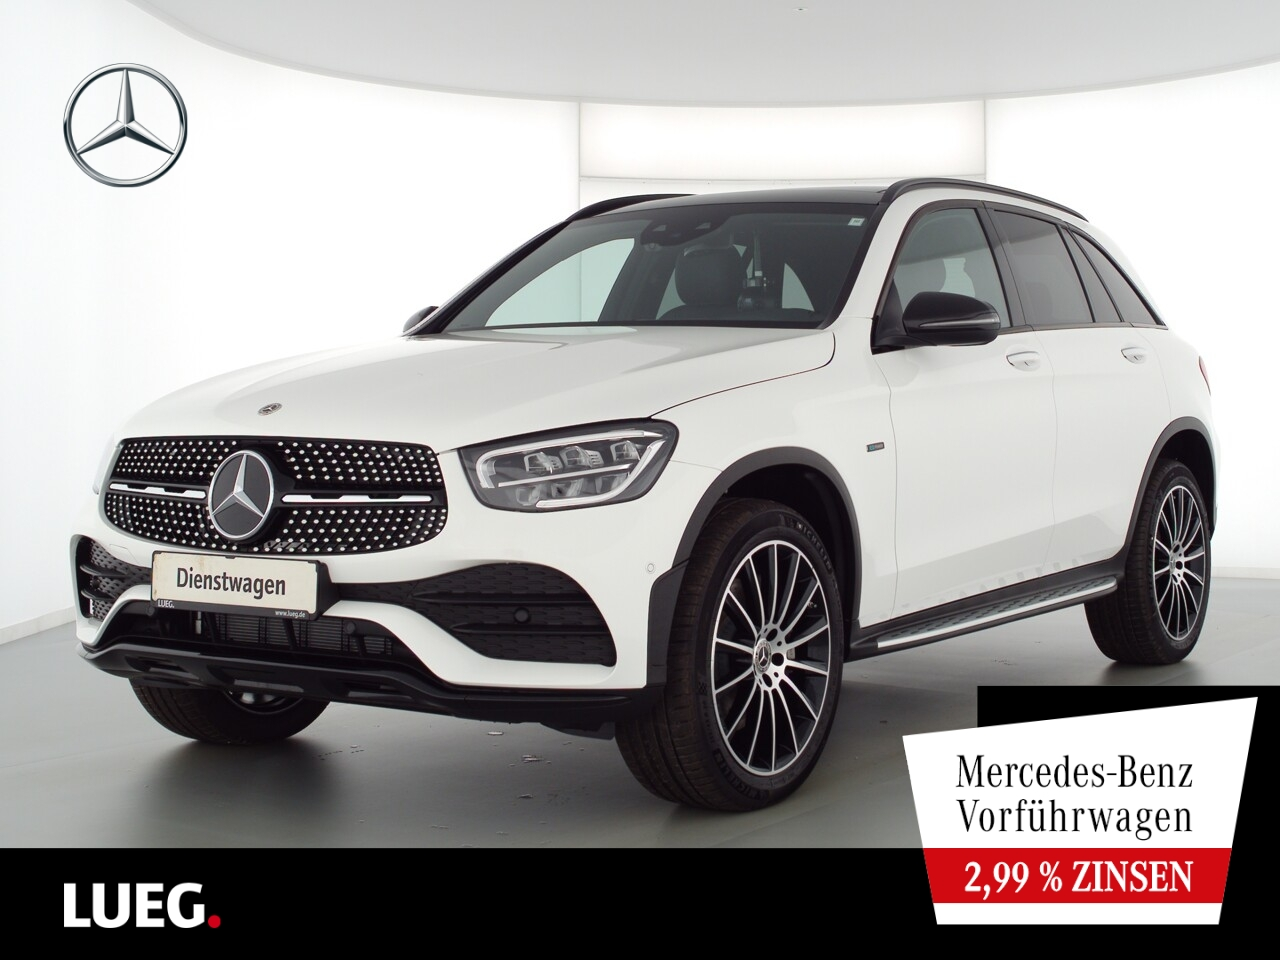 Mercedes-Benz GLC 300 e 4M AMG+20''+HUD+PANO+KEYLESS+DISTRONI, Jahr 2021, Hybrid